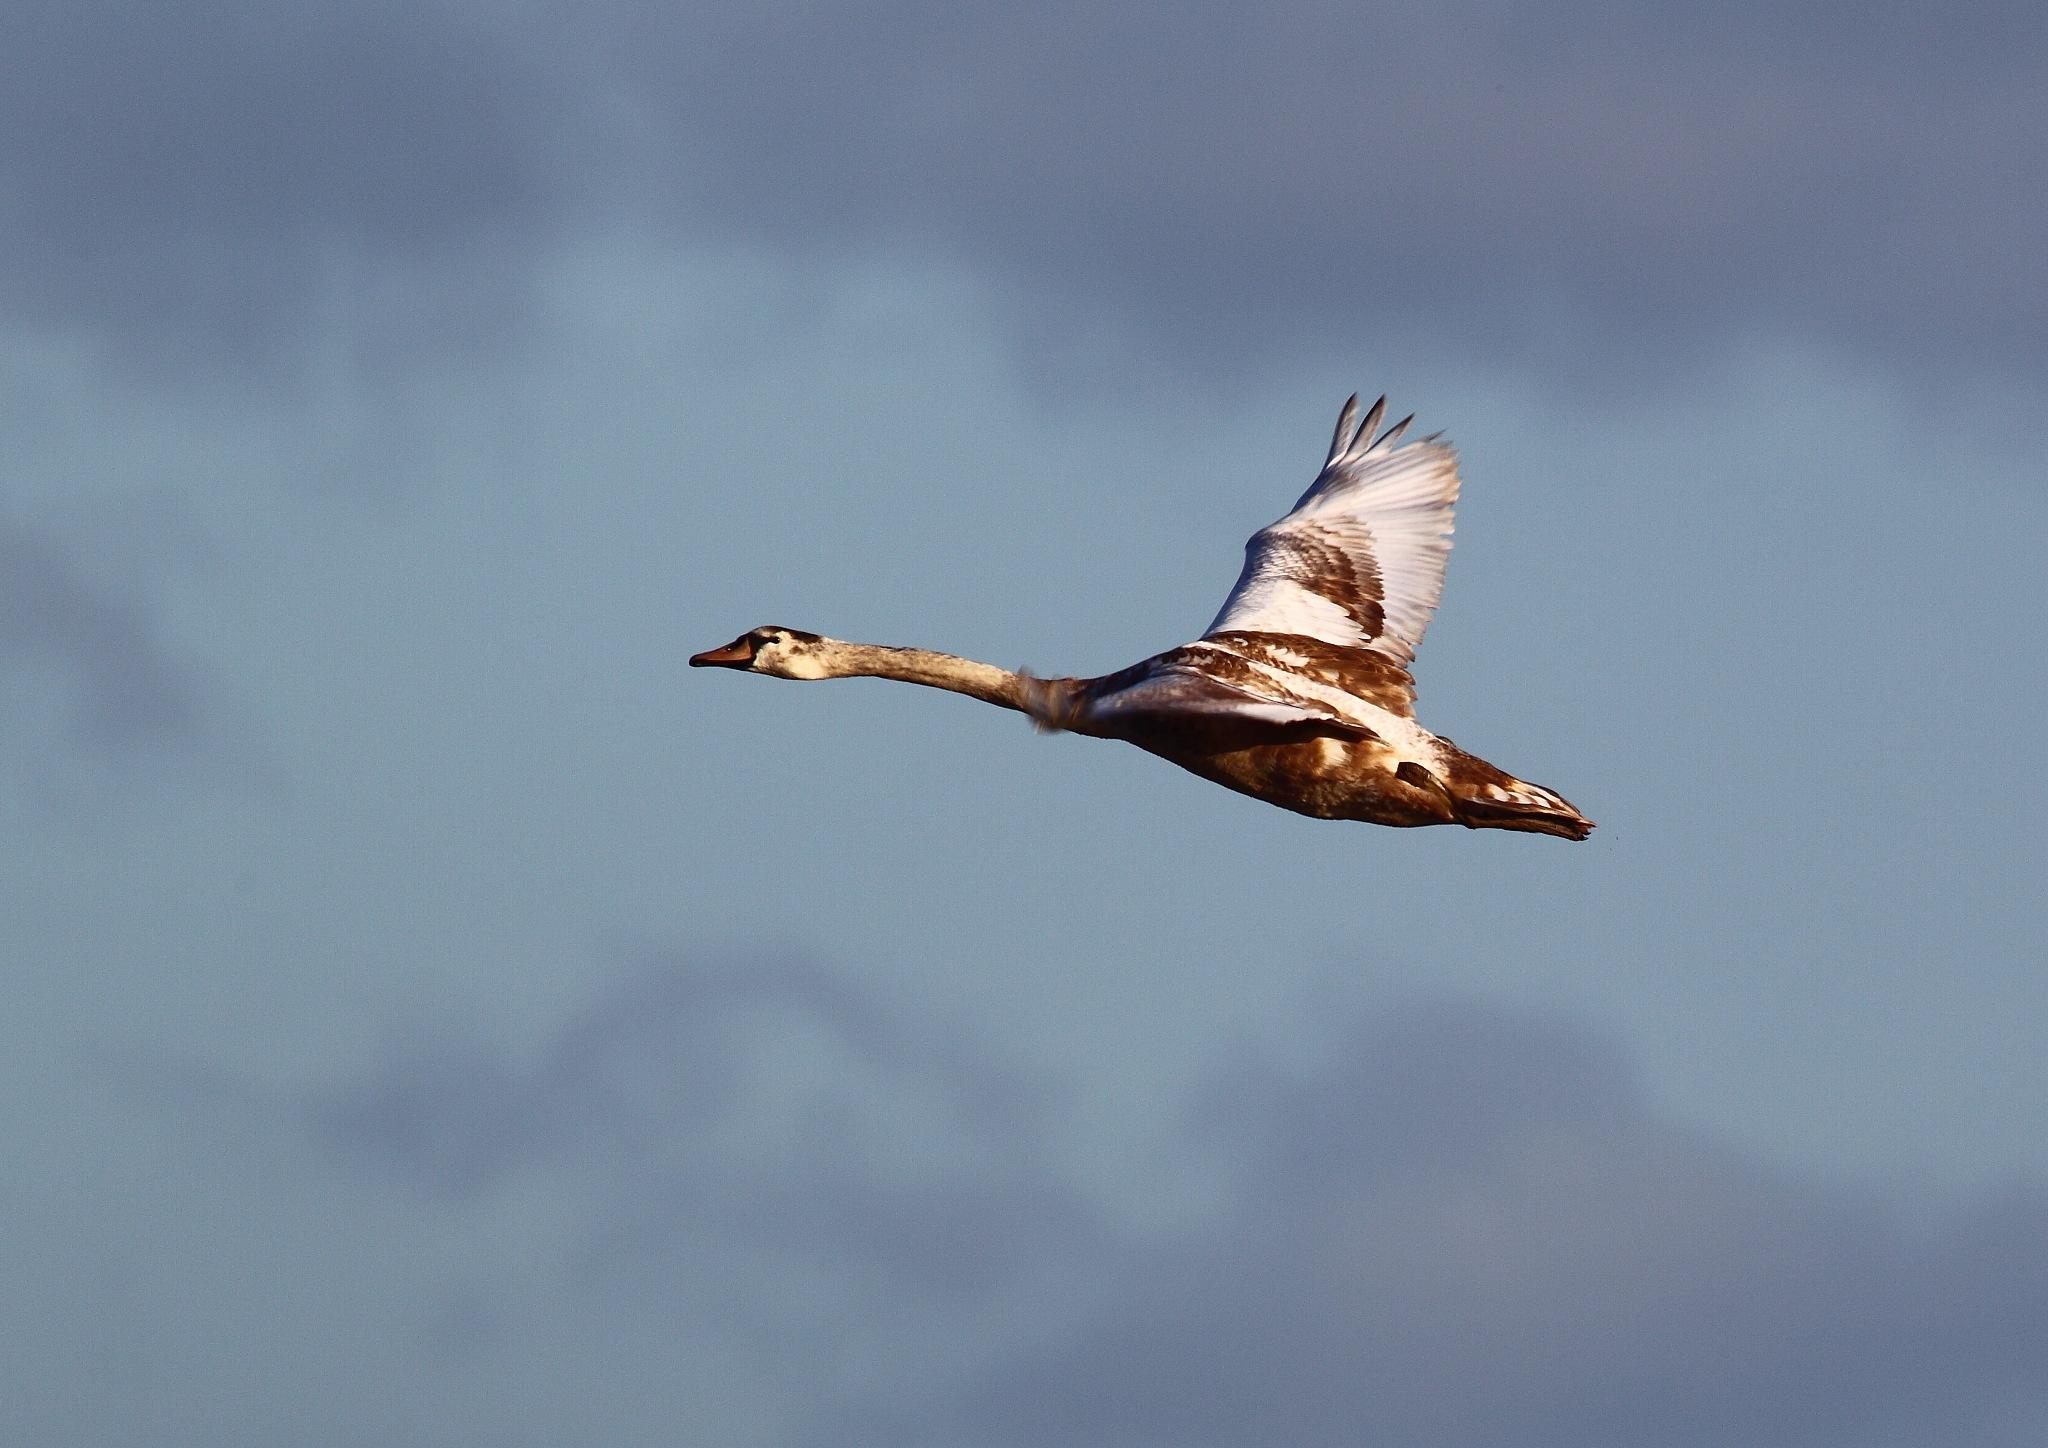 Swan 1 by Philip Watson